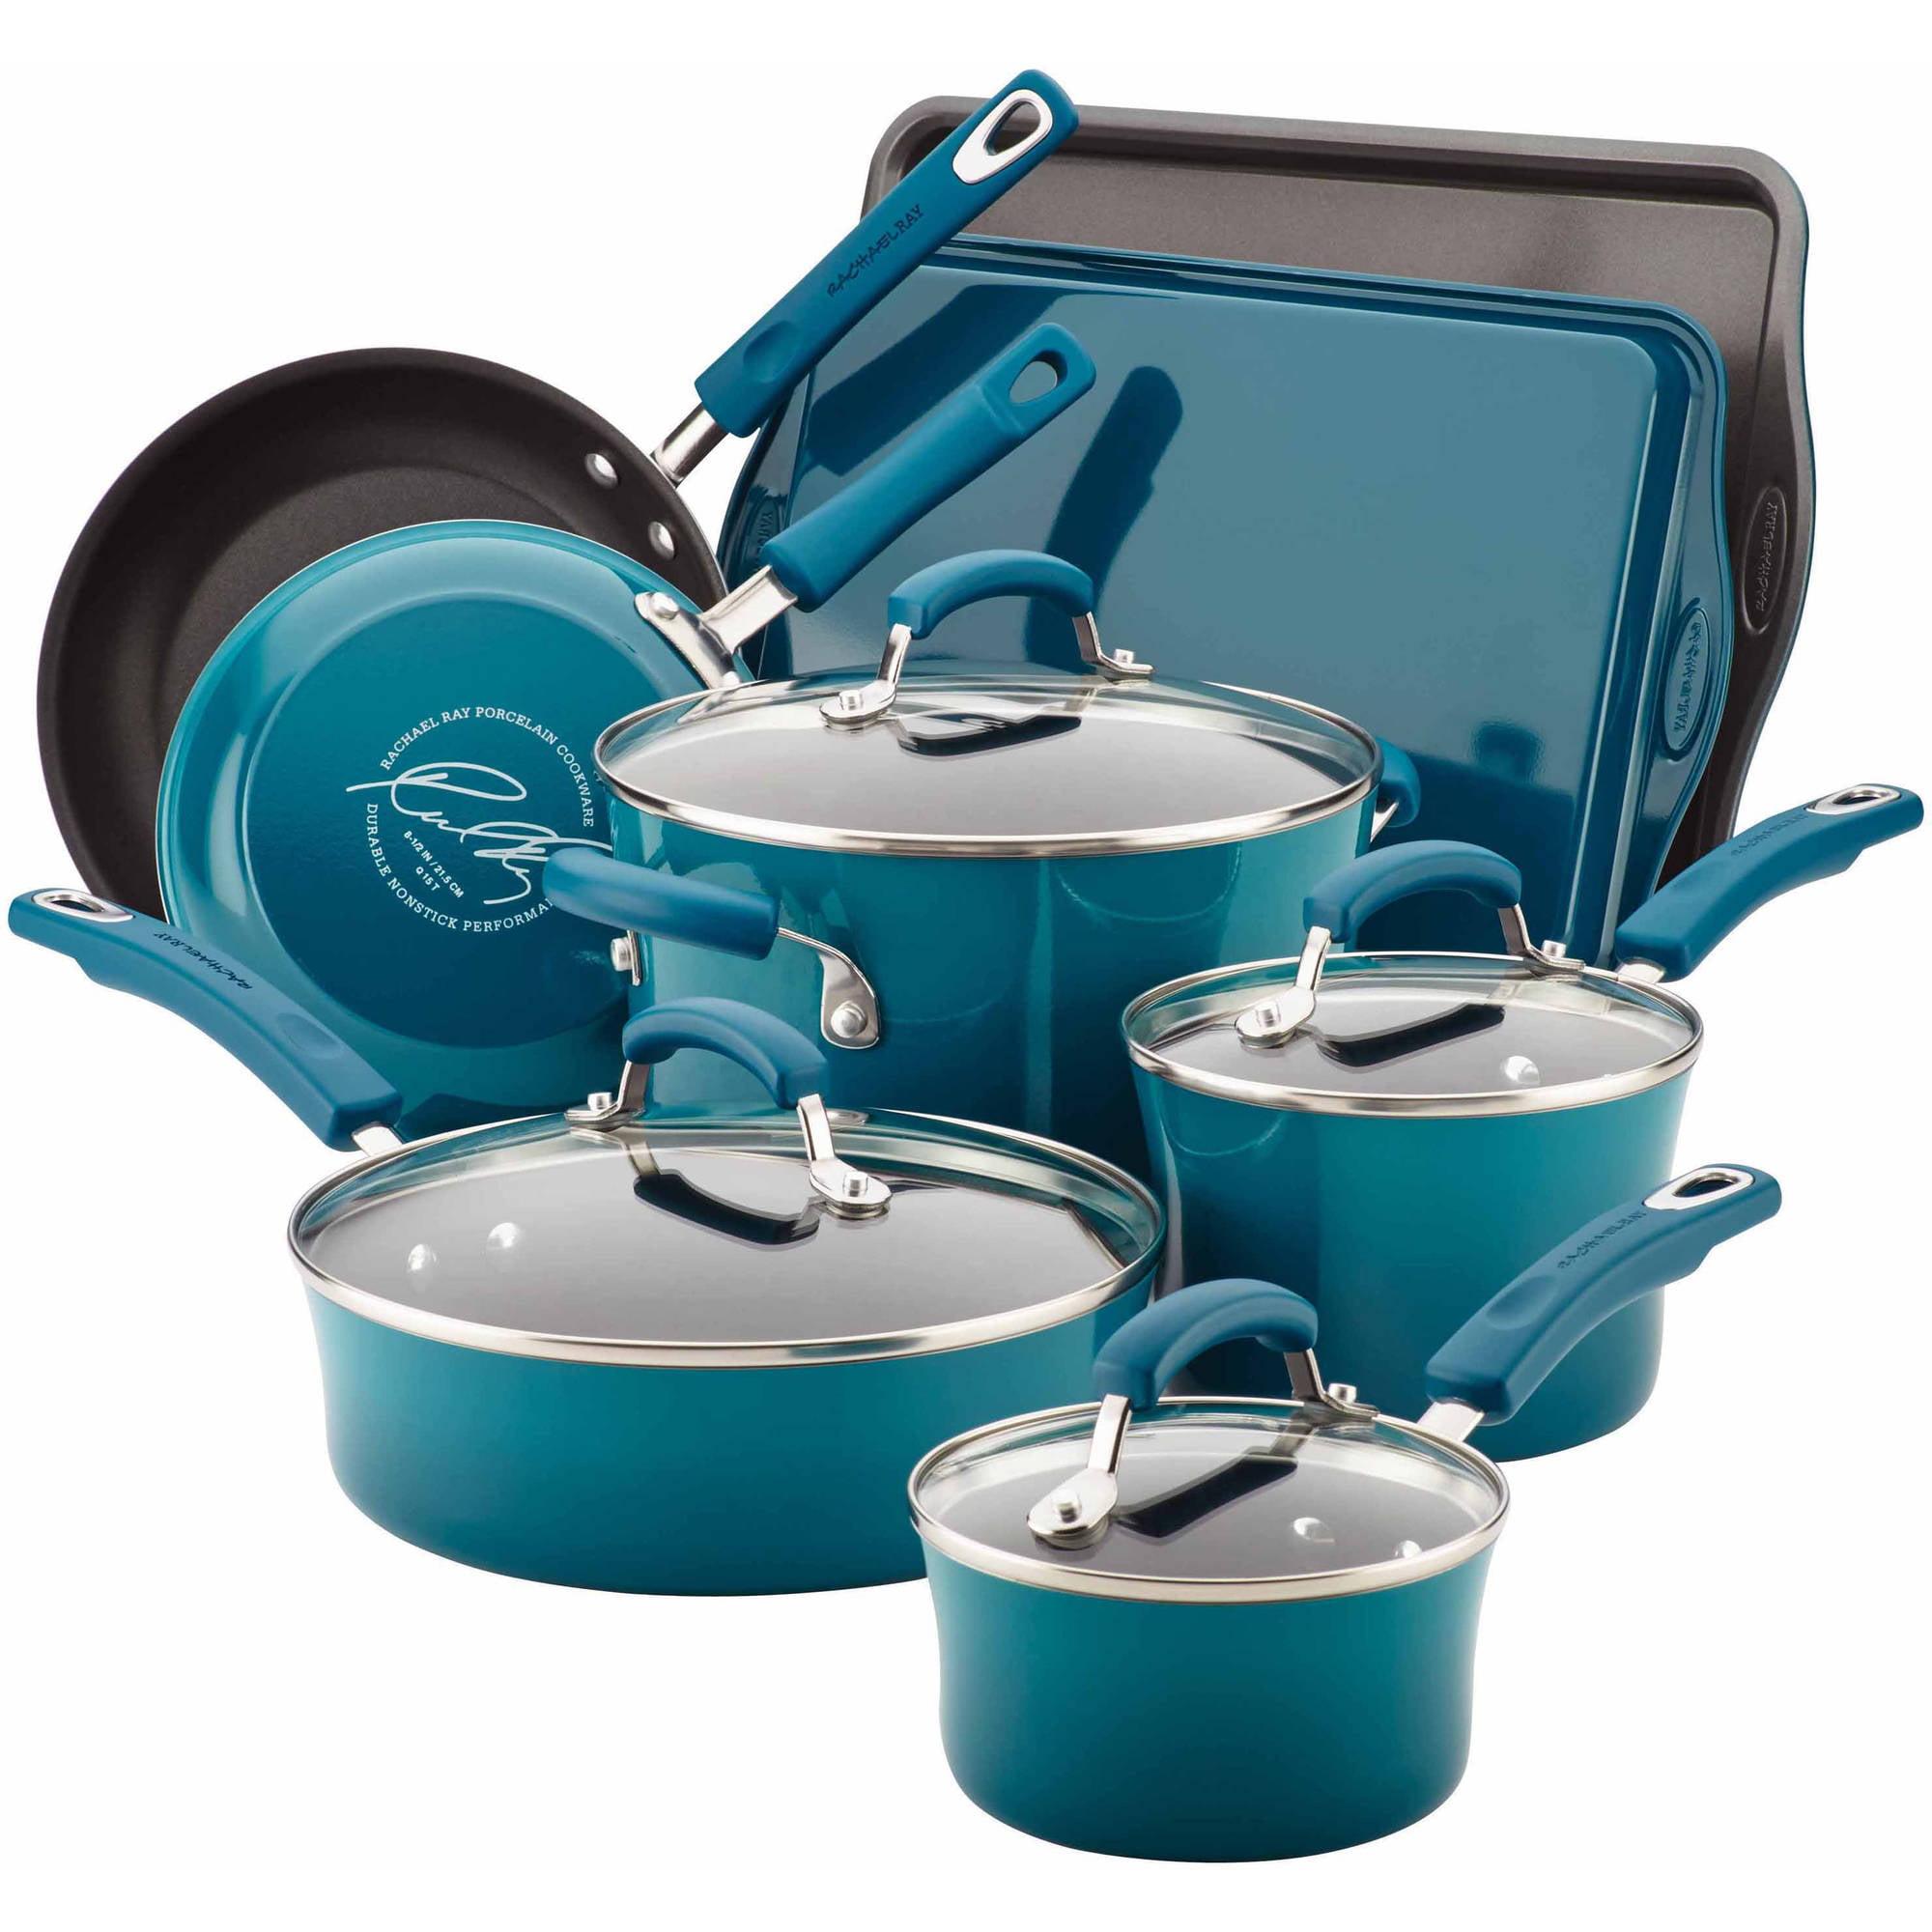 Rachael Ray Hard Enamel Nonstick 12-Piece Cookware Set